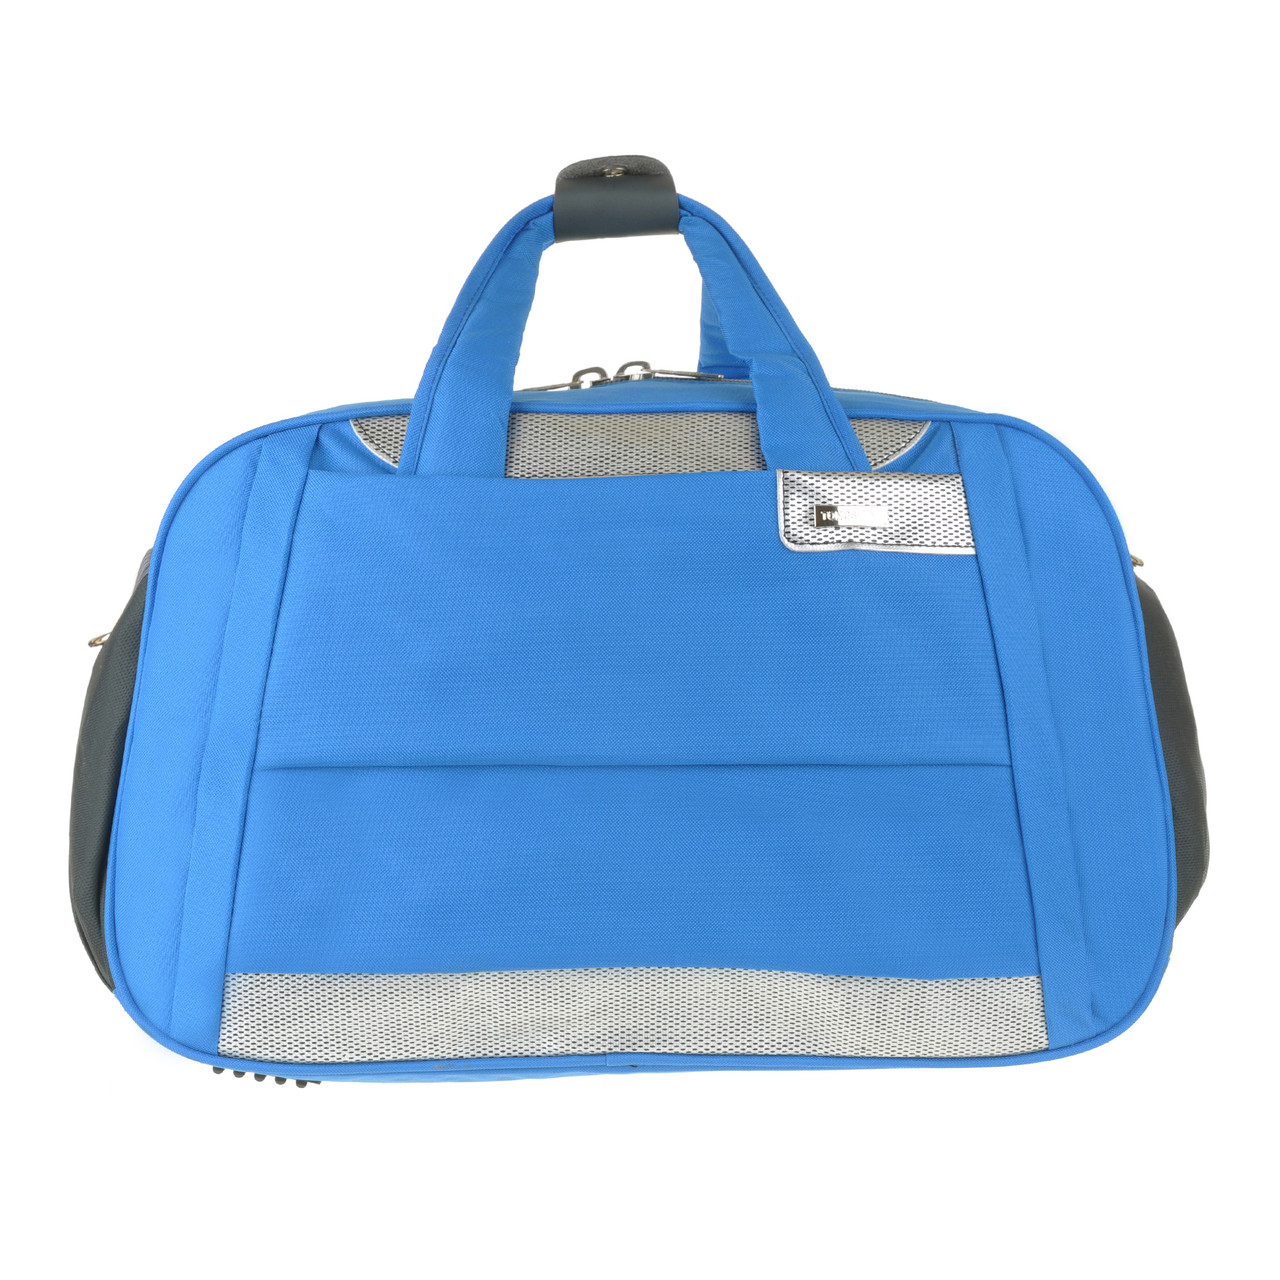 Дорожня сумка TONGSHENG голубая 54х34х20  полиэстер на ПВХ основе кс99929гол